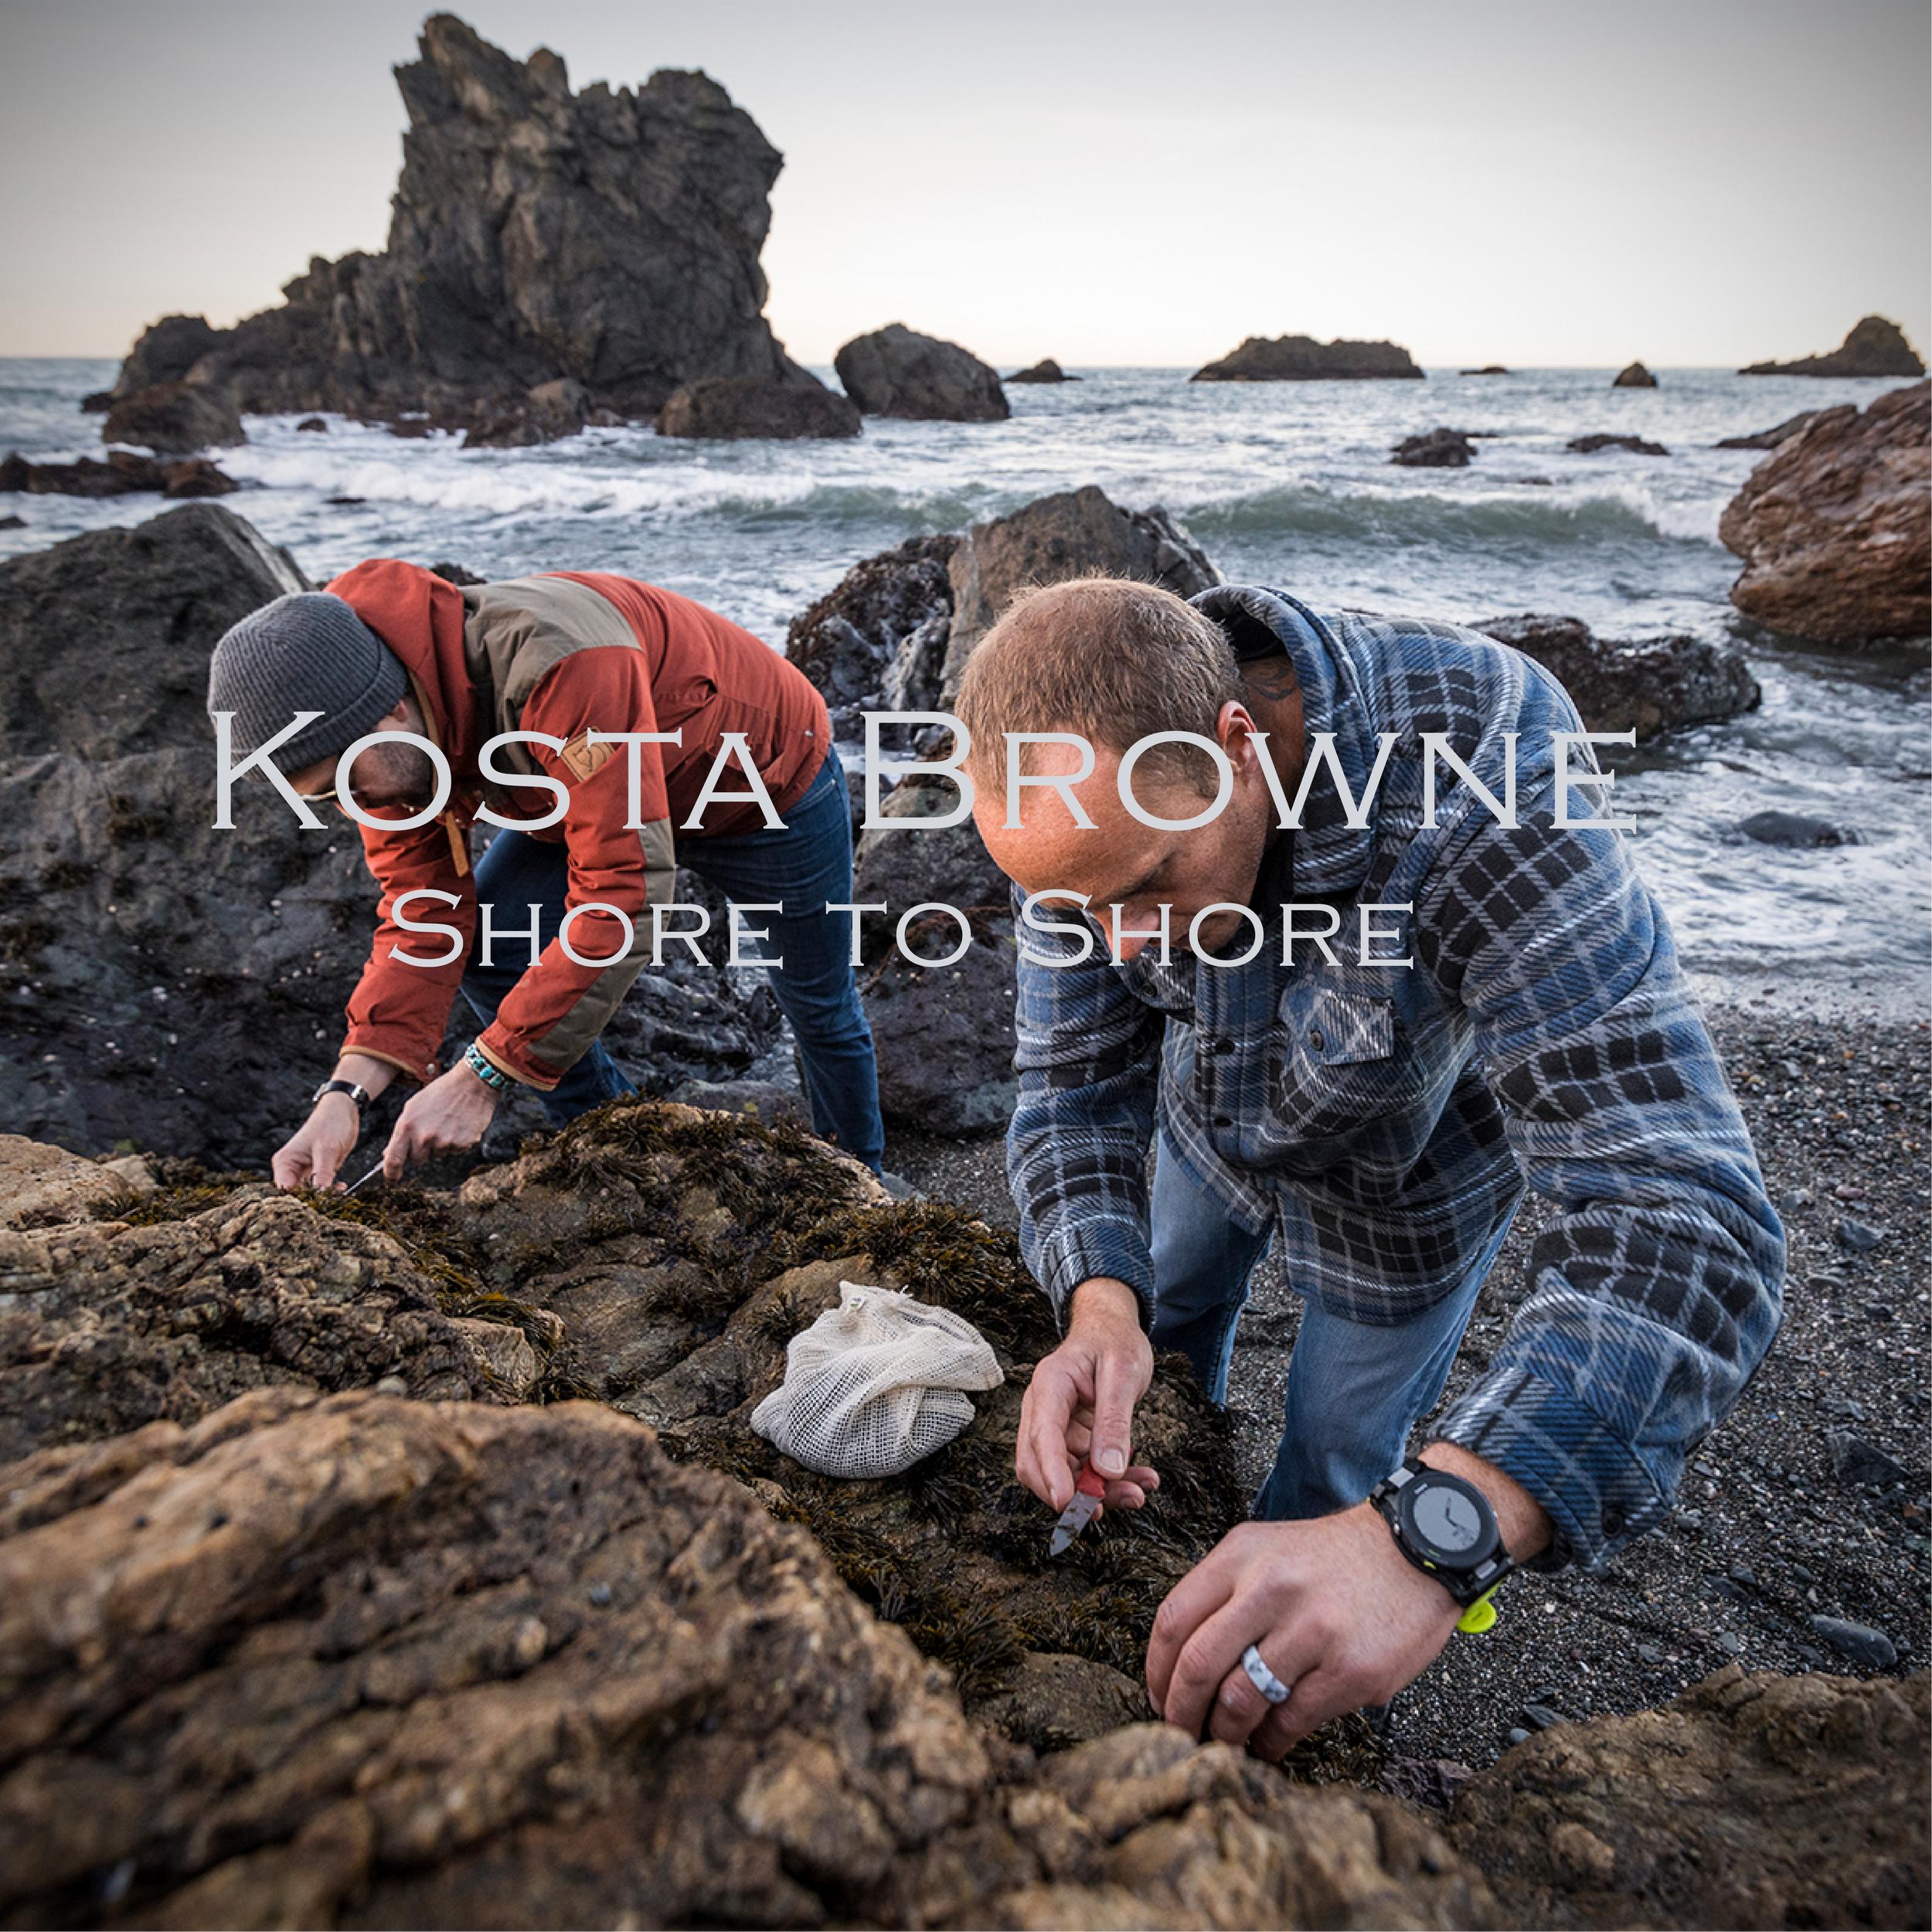 Kosta Browne- Shore to Shore